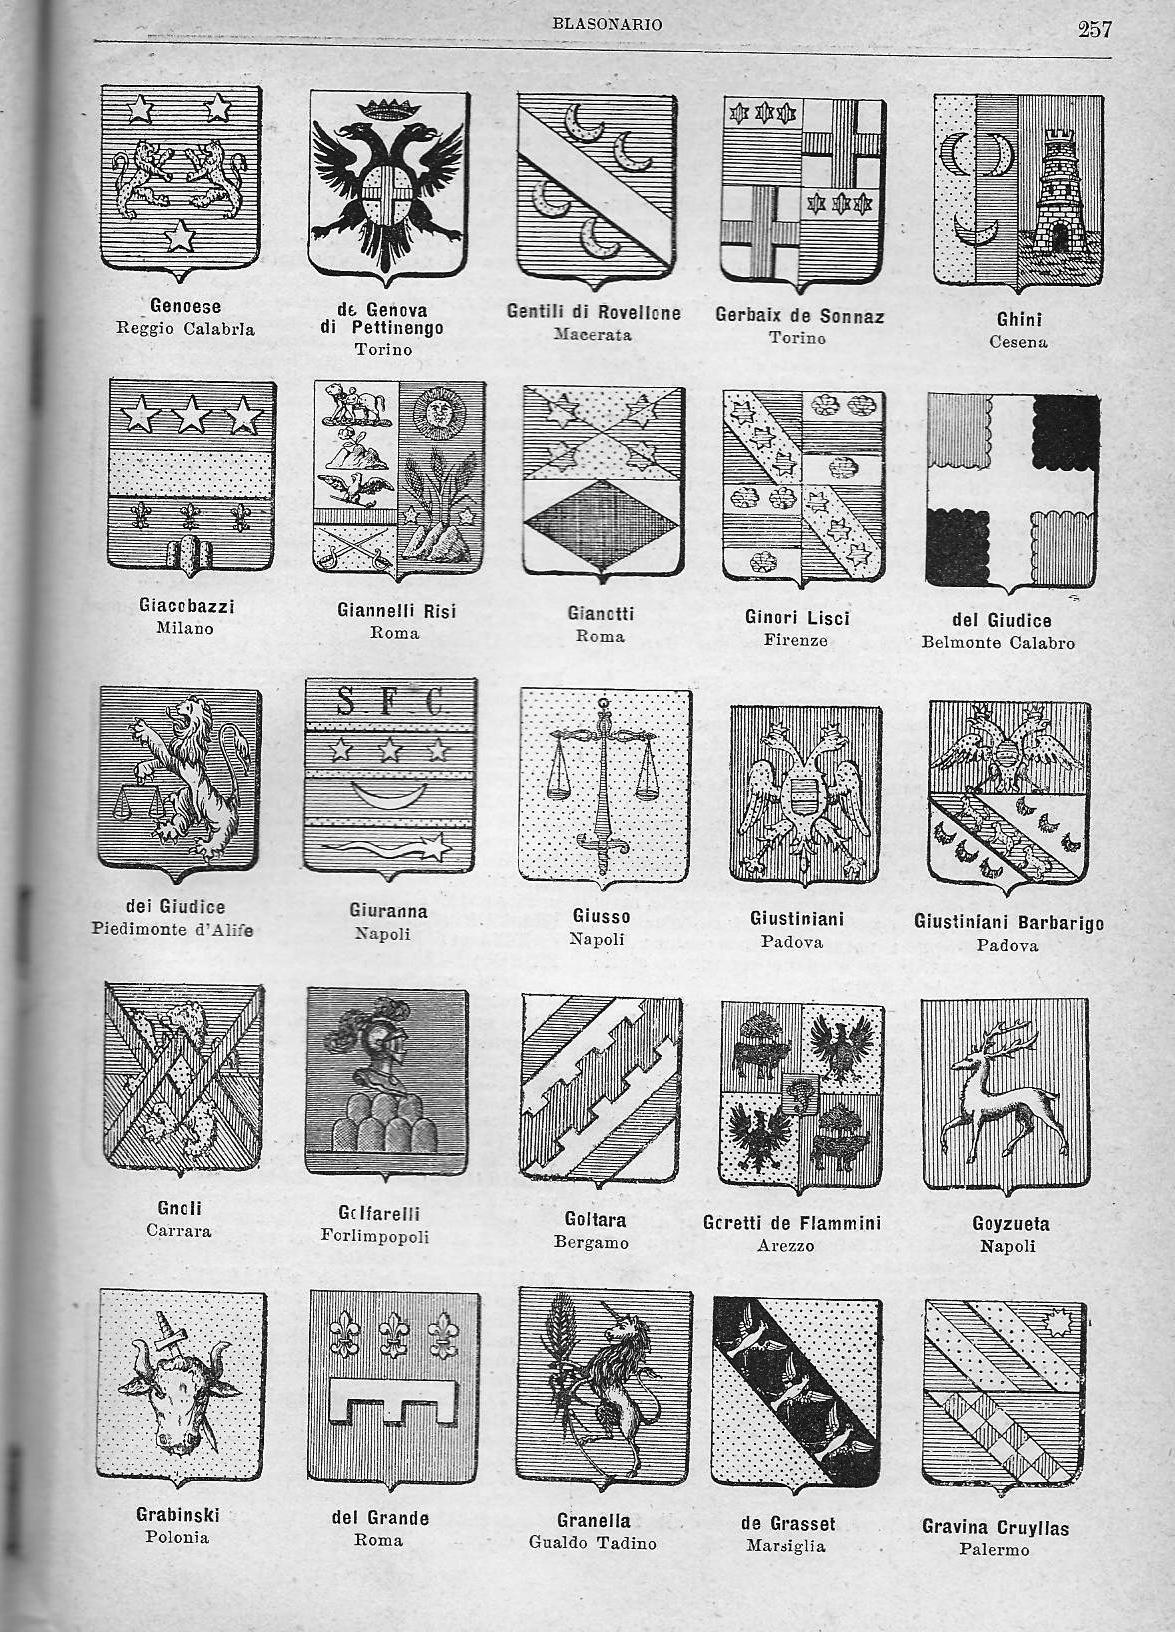 Calendario 1900.File Calendario D Oro 1900 Pagina 257 Jpg Wikimedia Commons